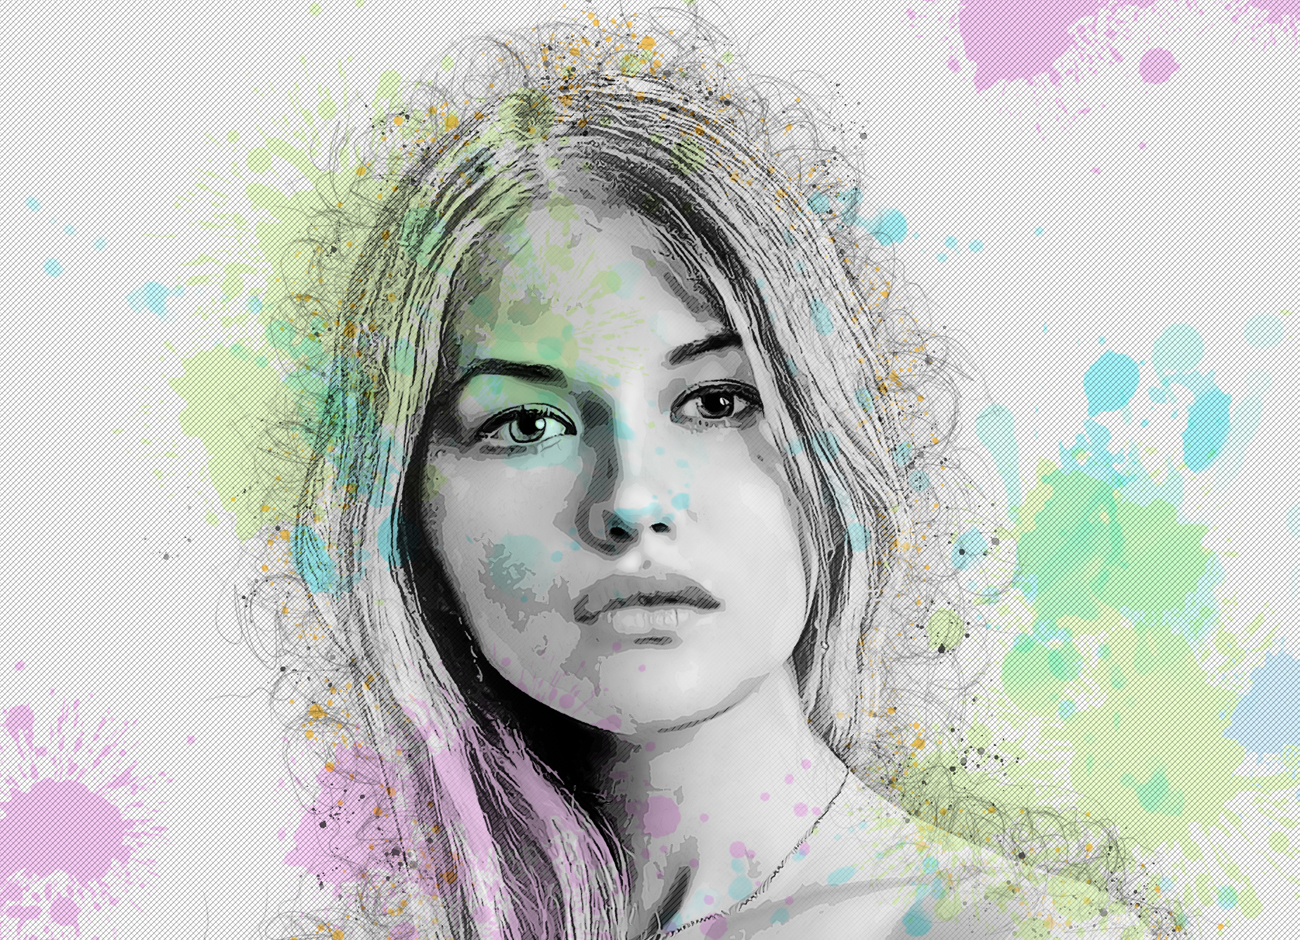 抽象铅笔素描效果照片处理特效PS动作模板 Abstract Sketch Photoshop Action插图9